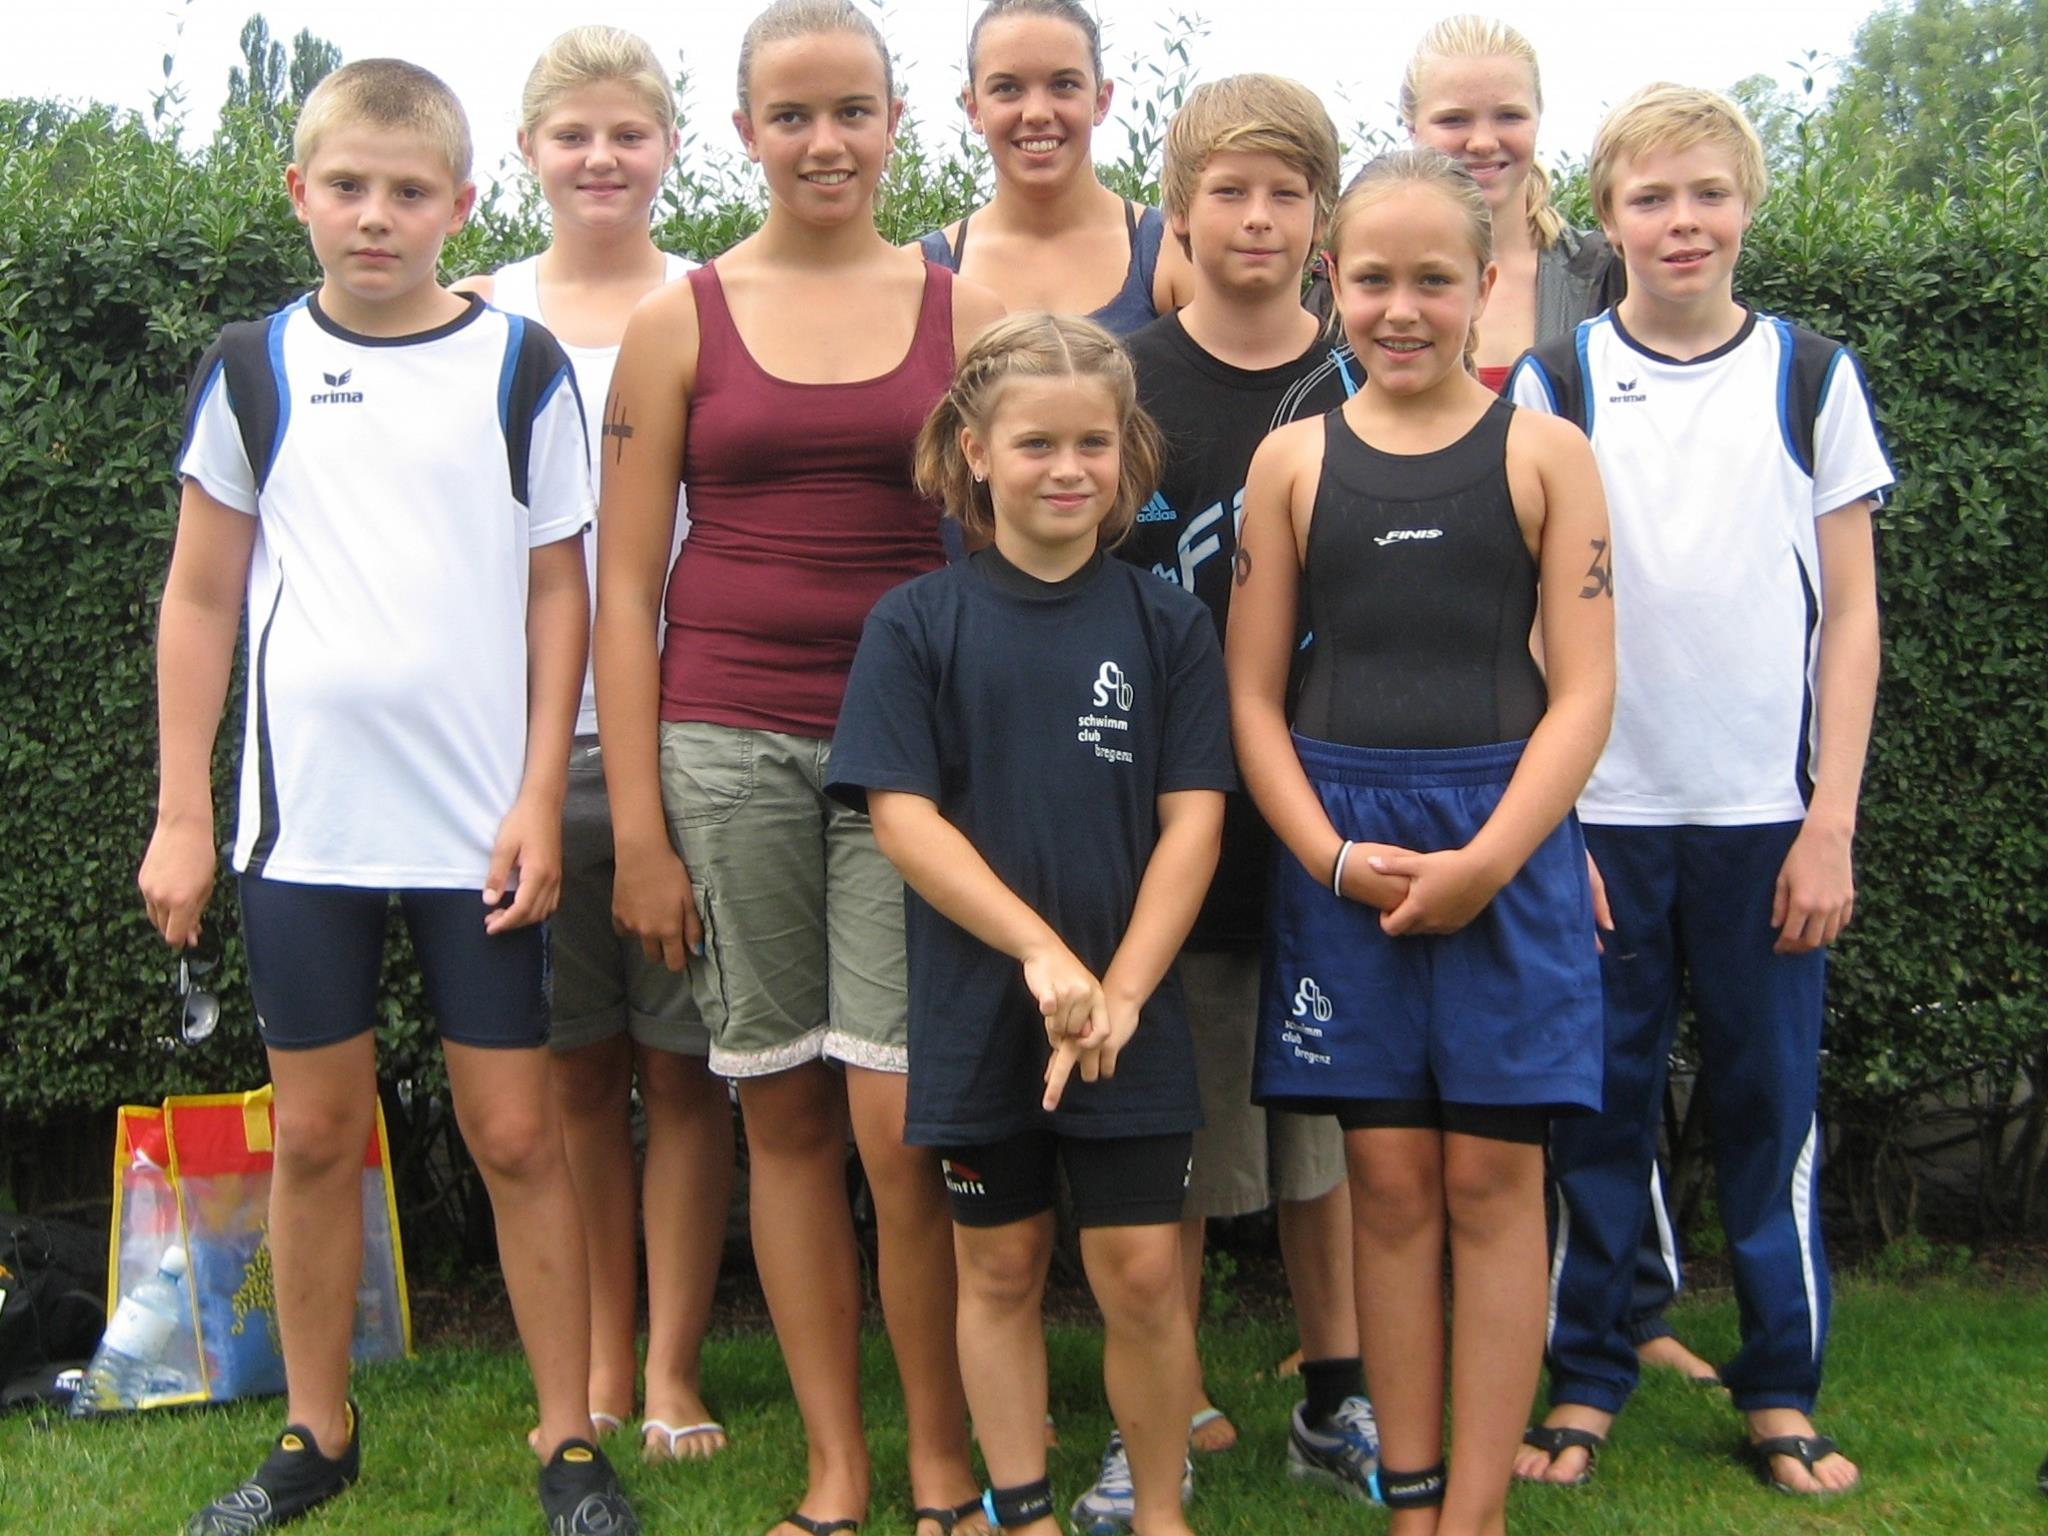 vlnr: Jonas, Anne-Sophie, Caroline, Paula, Magdalena, Lukas, Lisa, Johanna und Wendelin